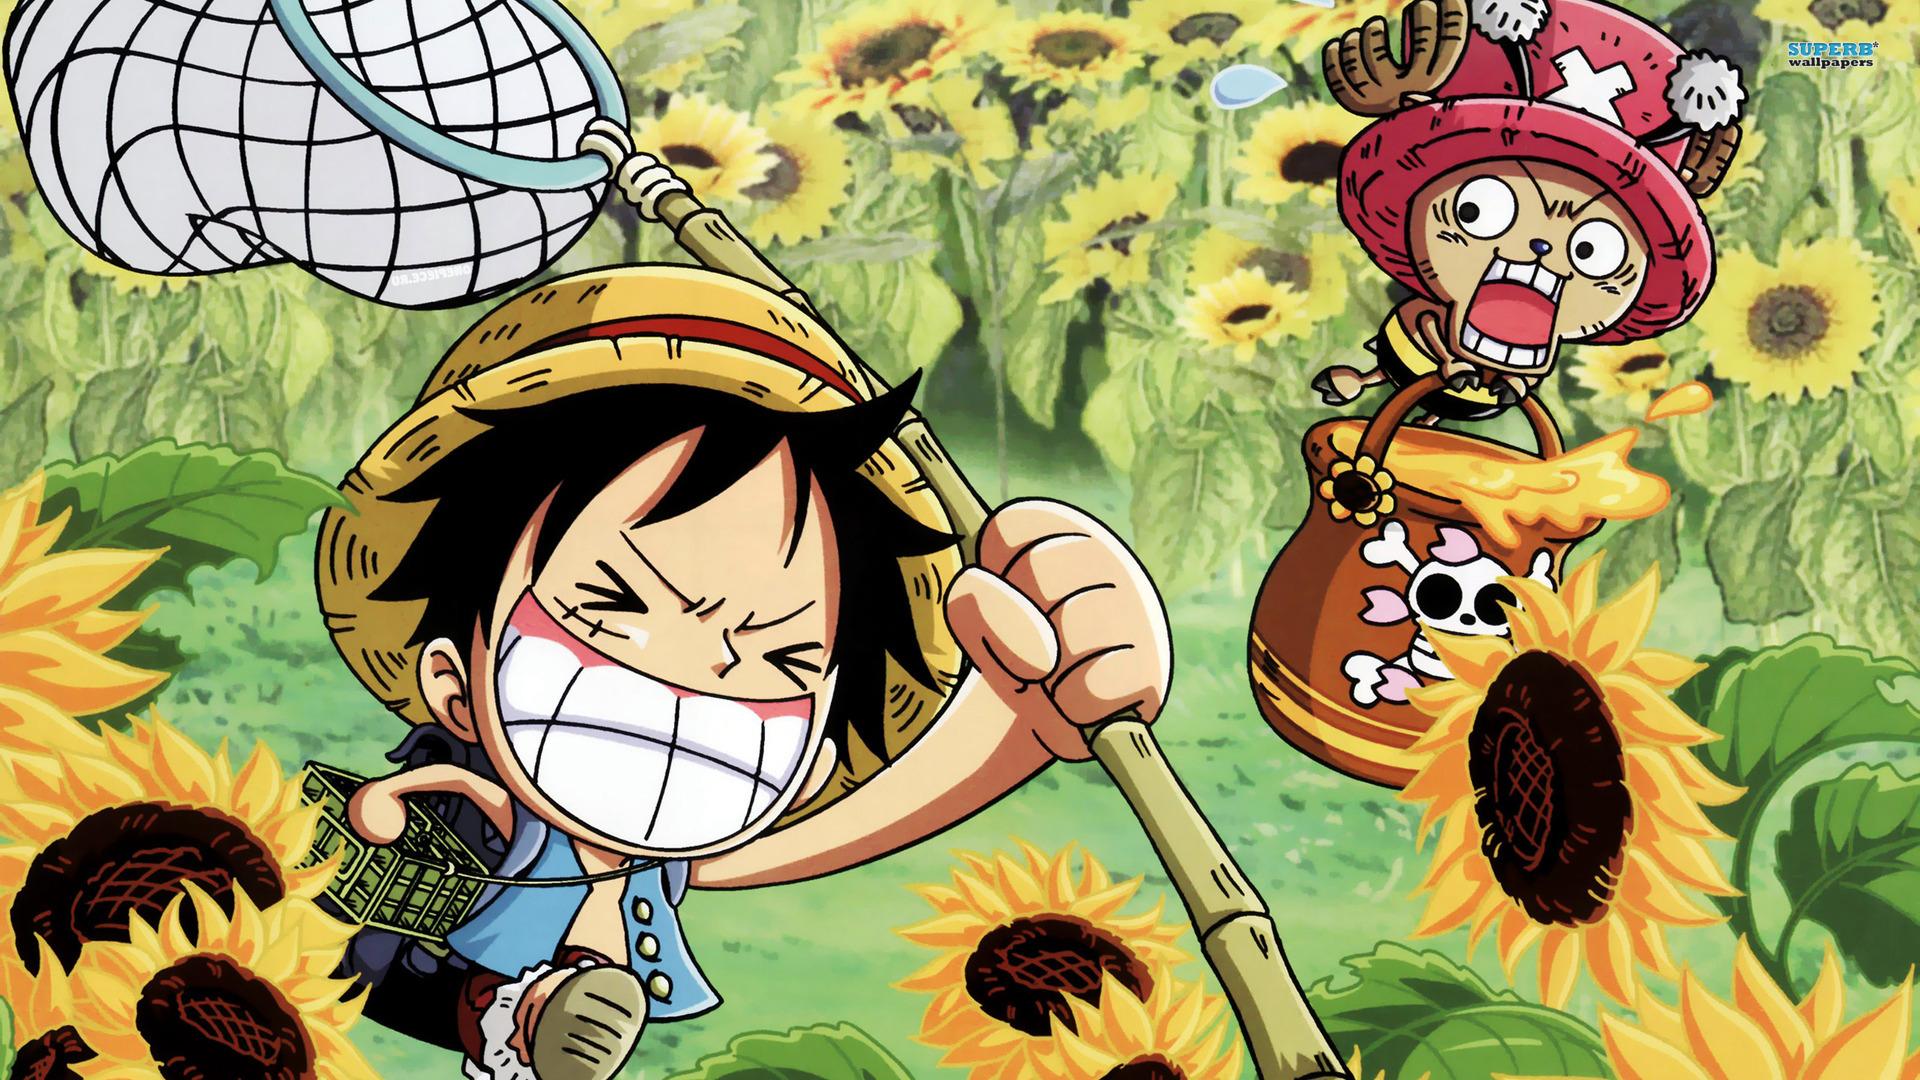 One Piece 14102 1920 1080 Blog スマホ無料壁紙 ワンピース高